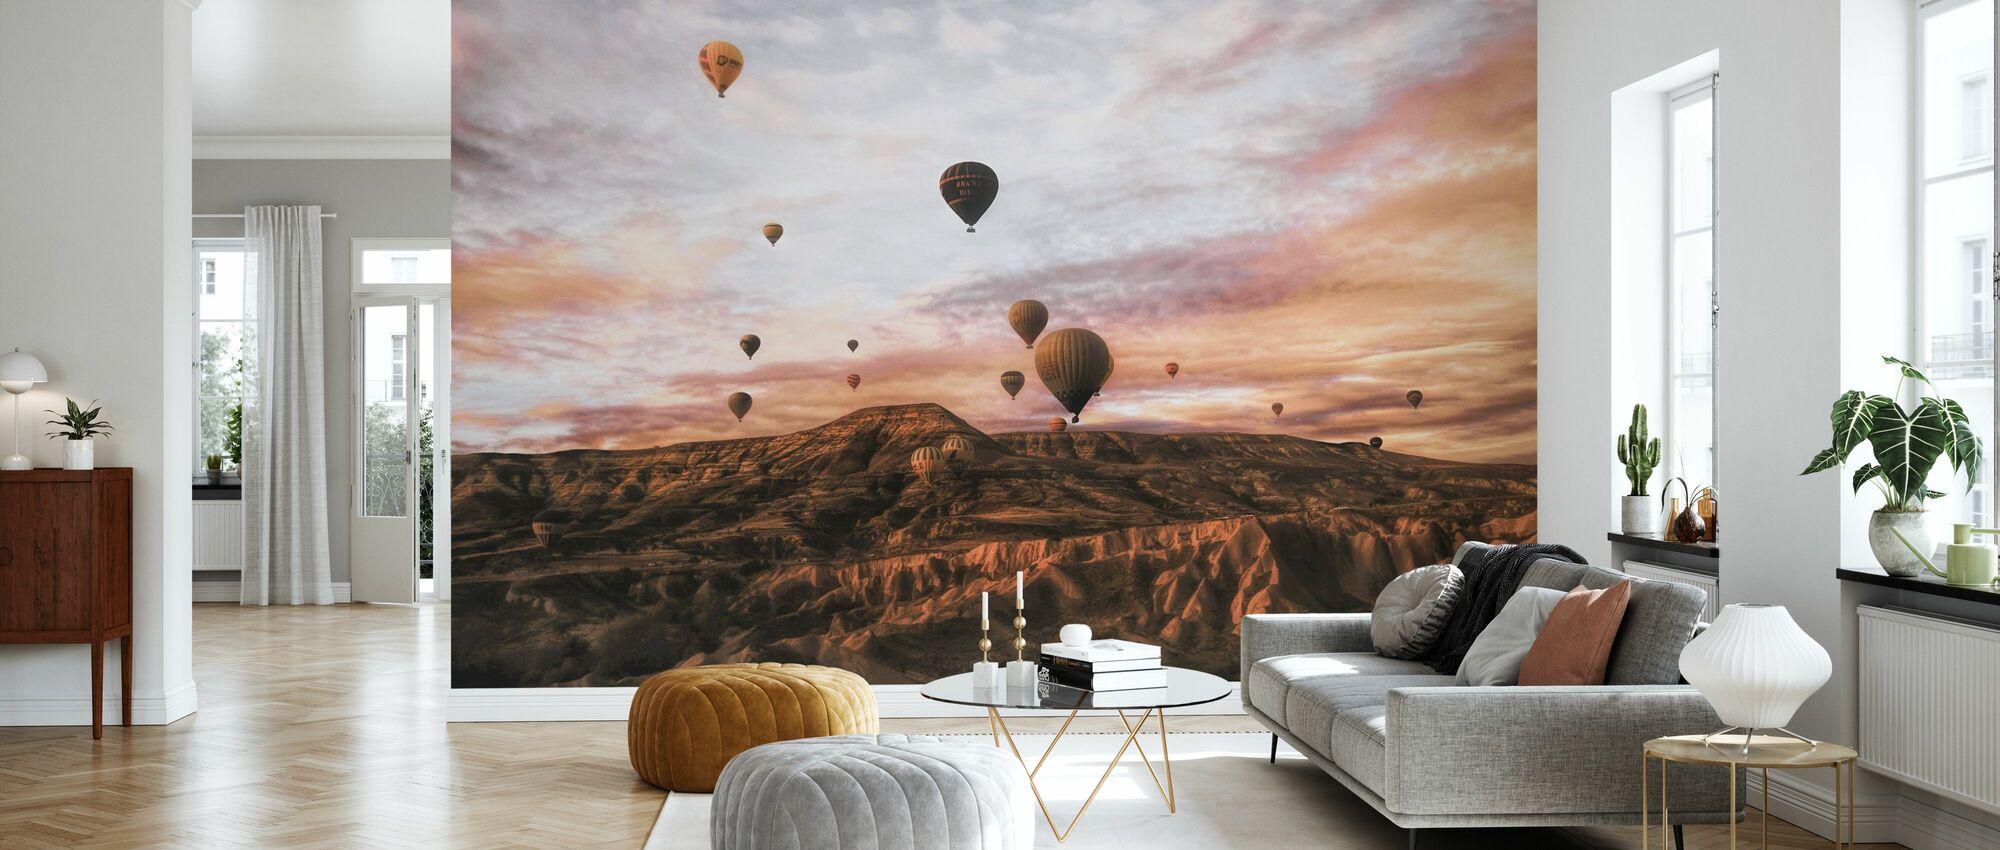 Cappodocia varmluftsballong - Tapet - Stue